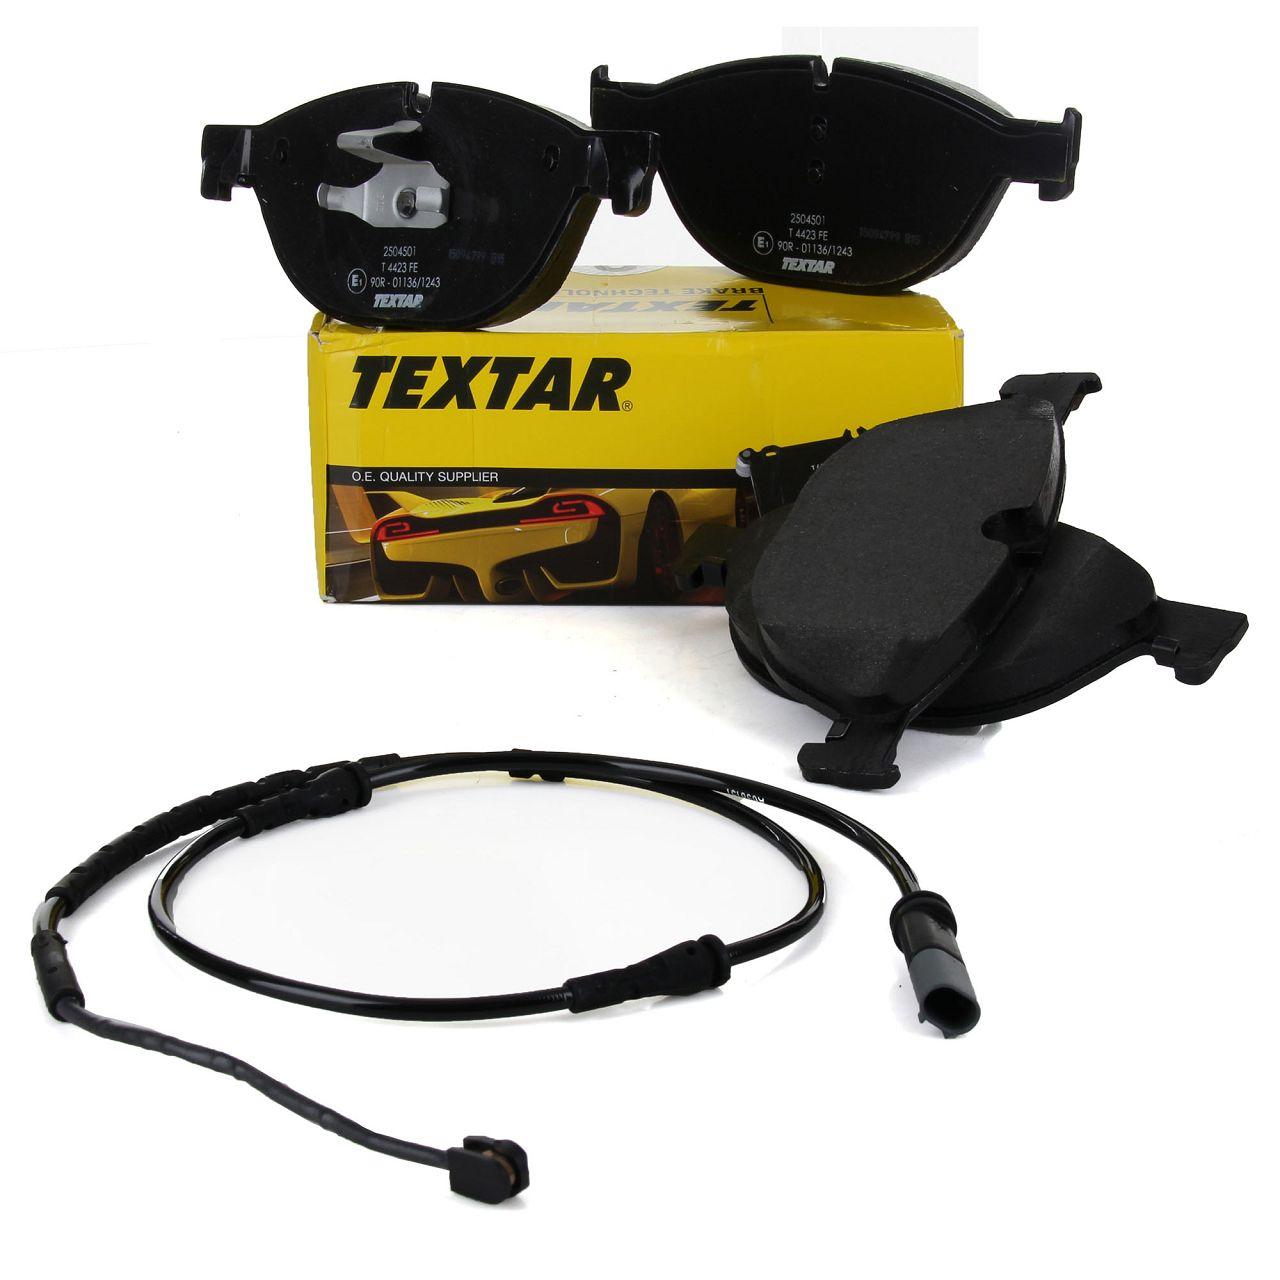 TEXTAR Bremsbeläge + Wako BMW 5er F10 F11 6er F12 F13 F06 F01-F04 vorne